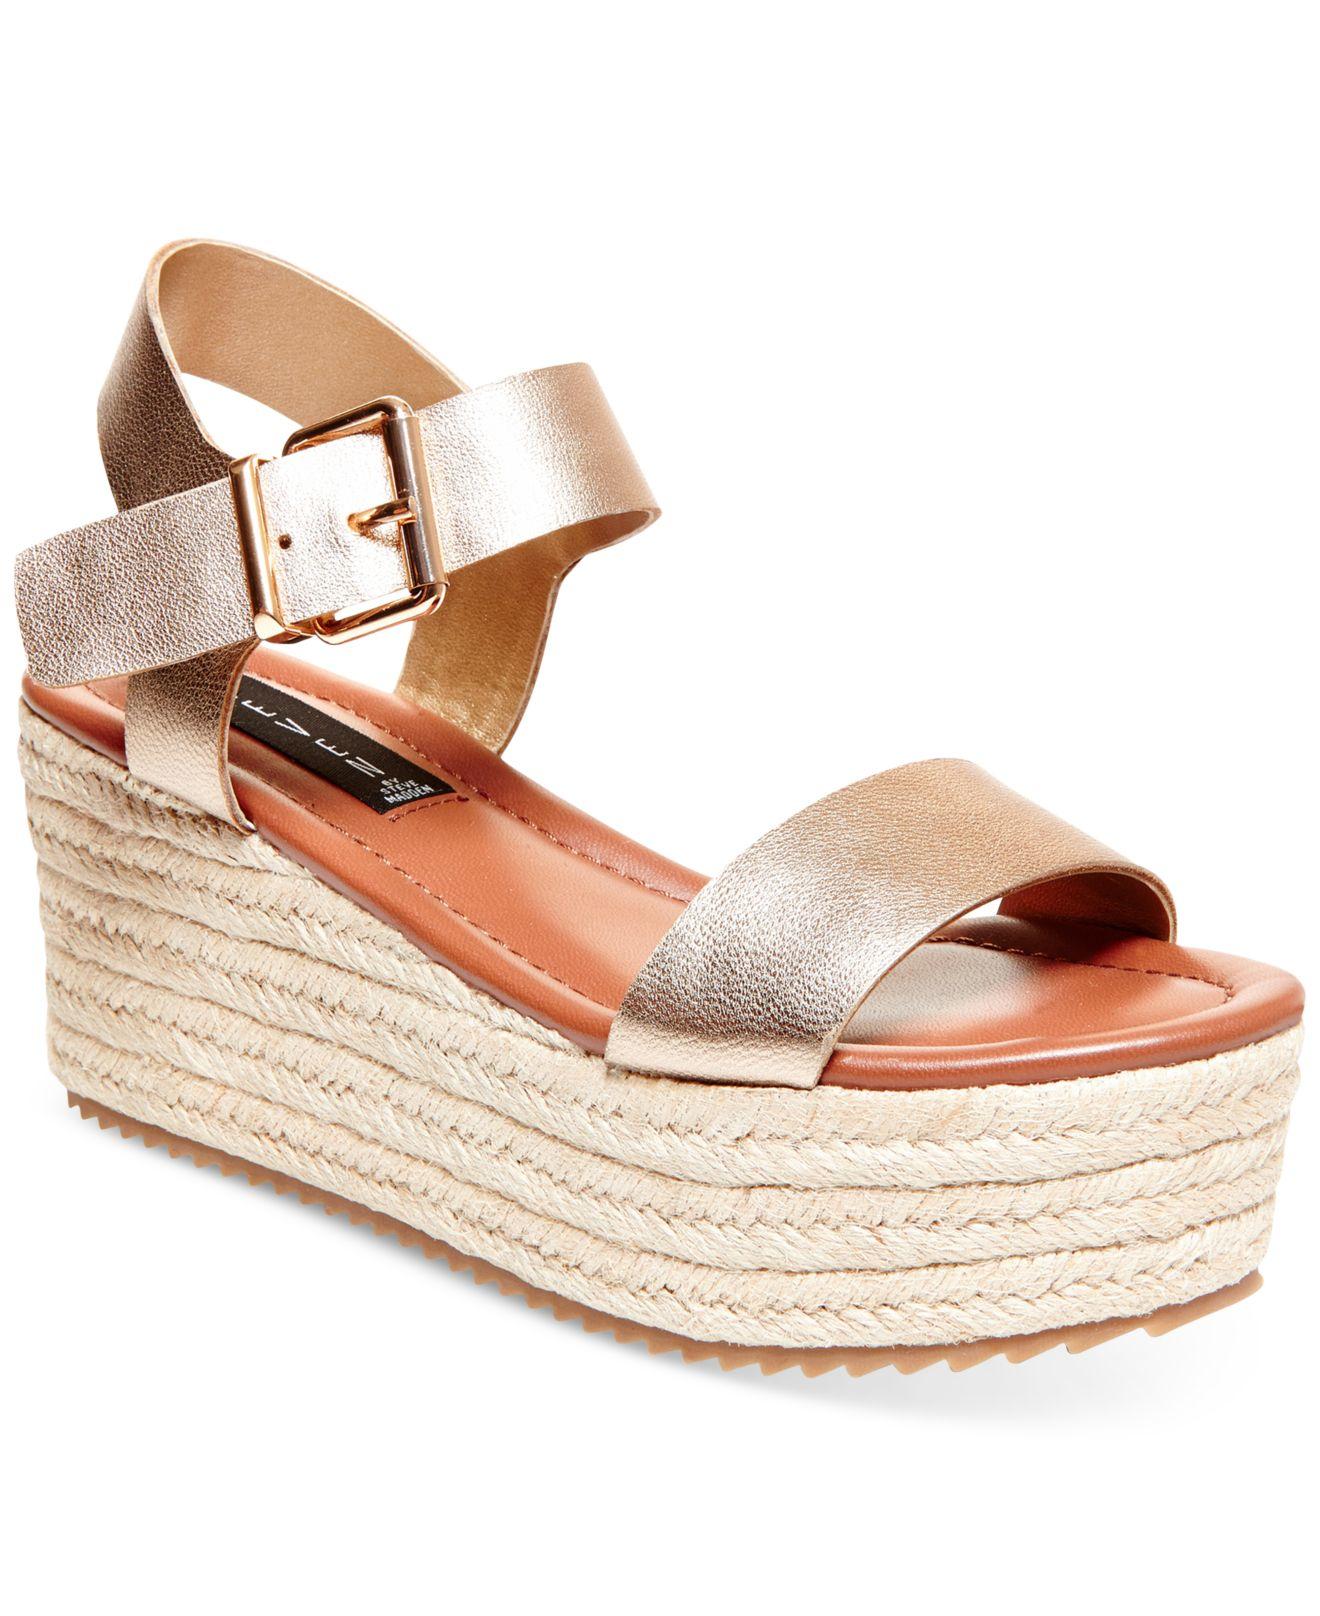 Steven By Steve Madden Women S Sabbie Platform Sandals In